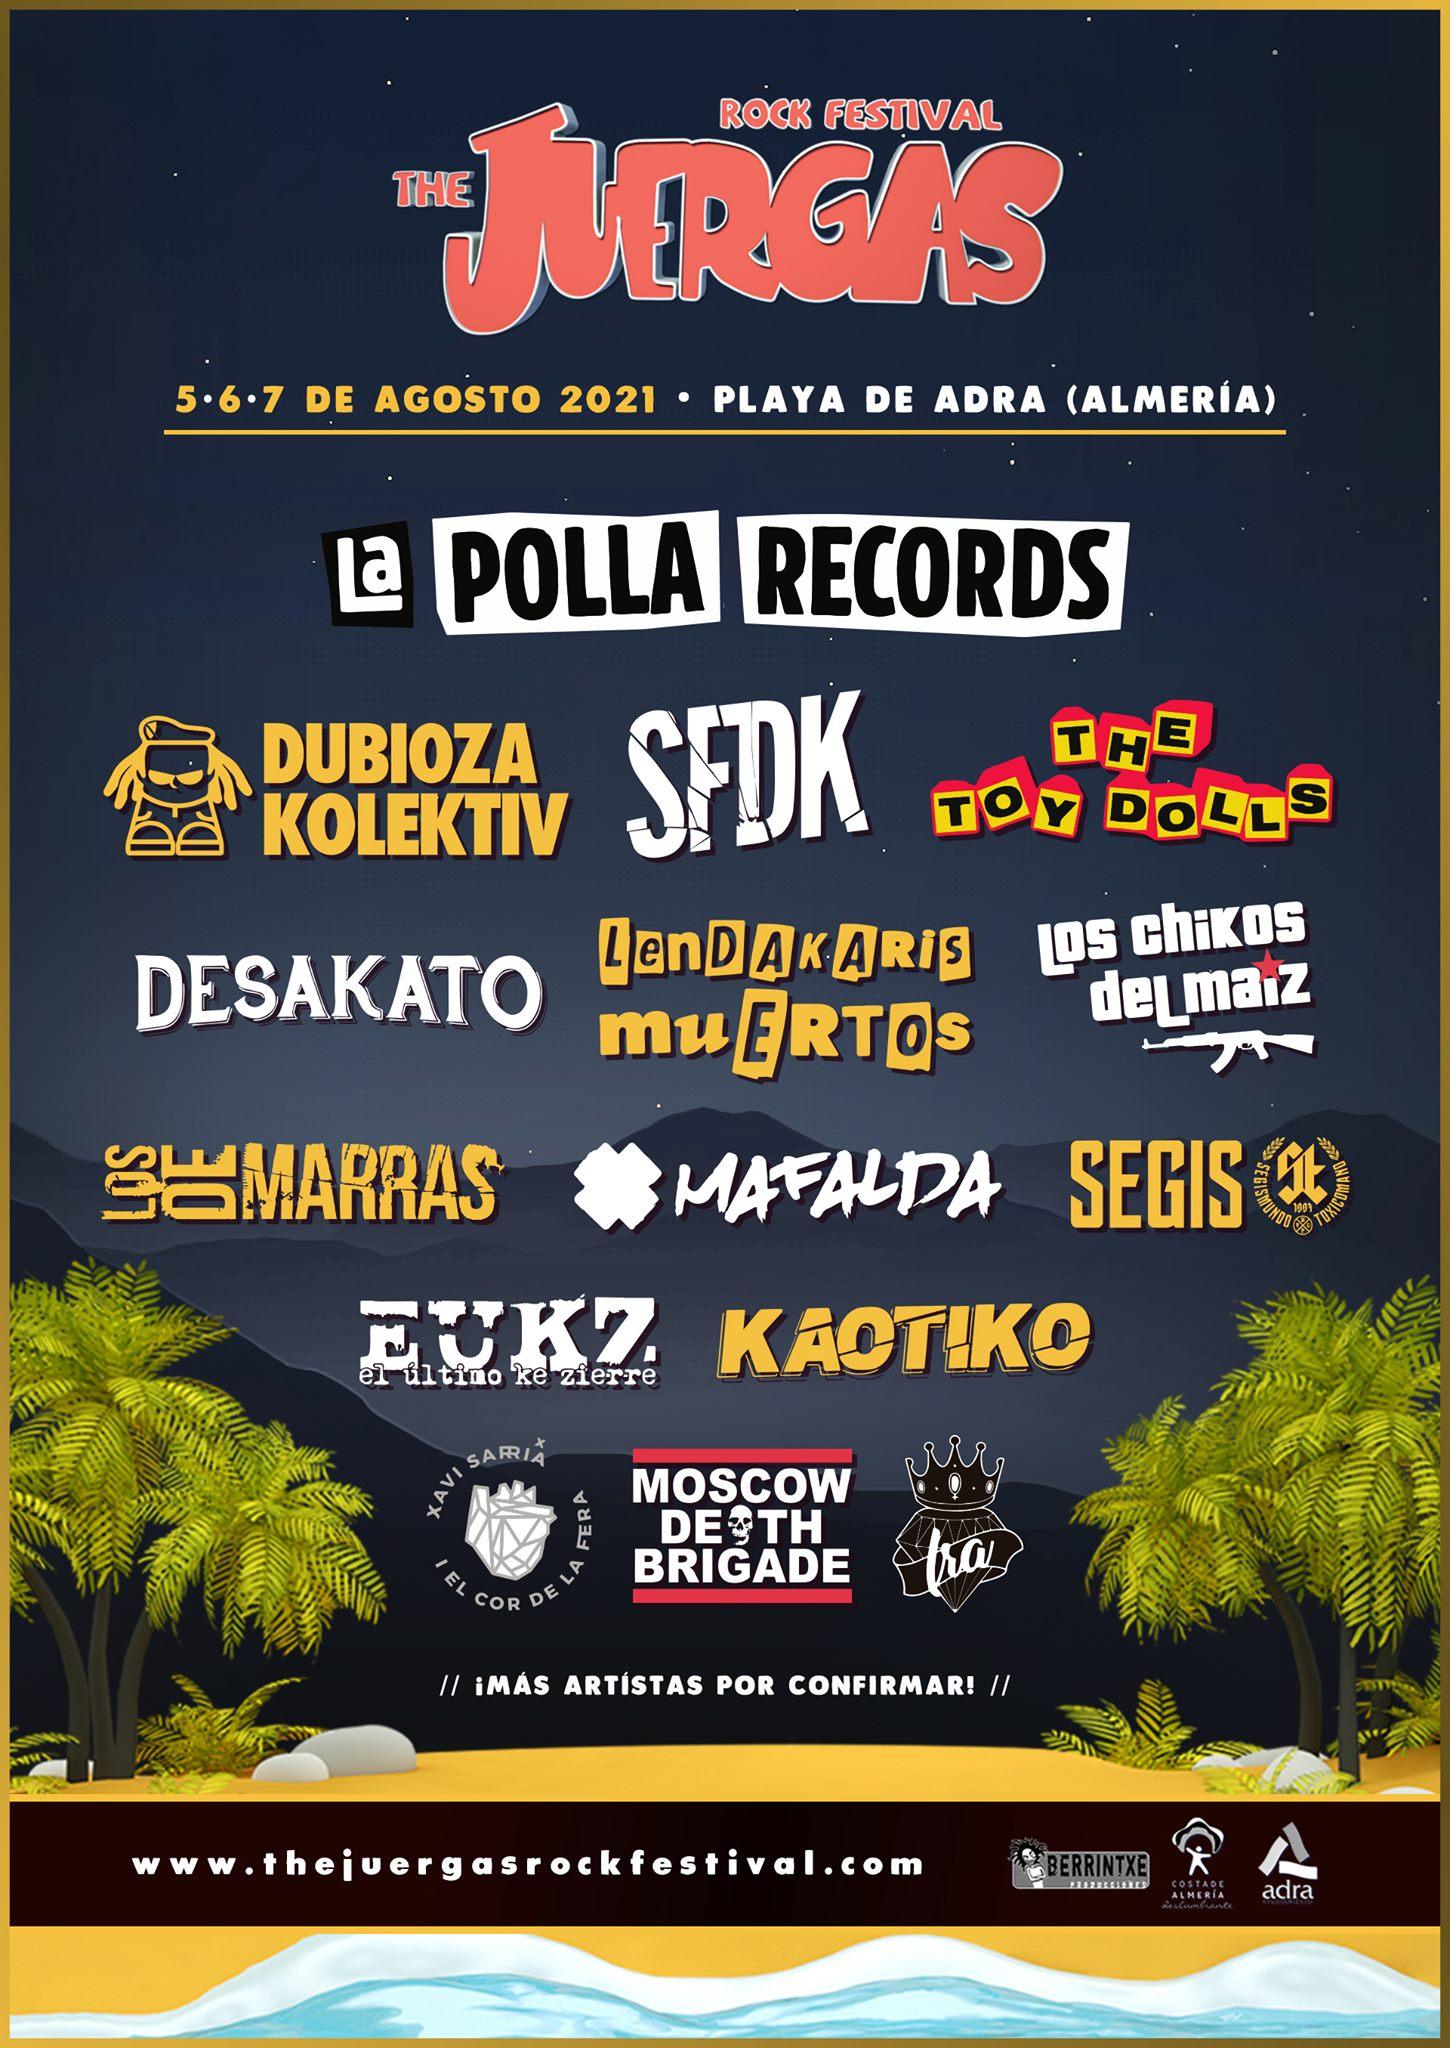 The Juergas Rock Festival 2021